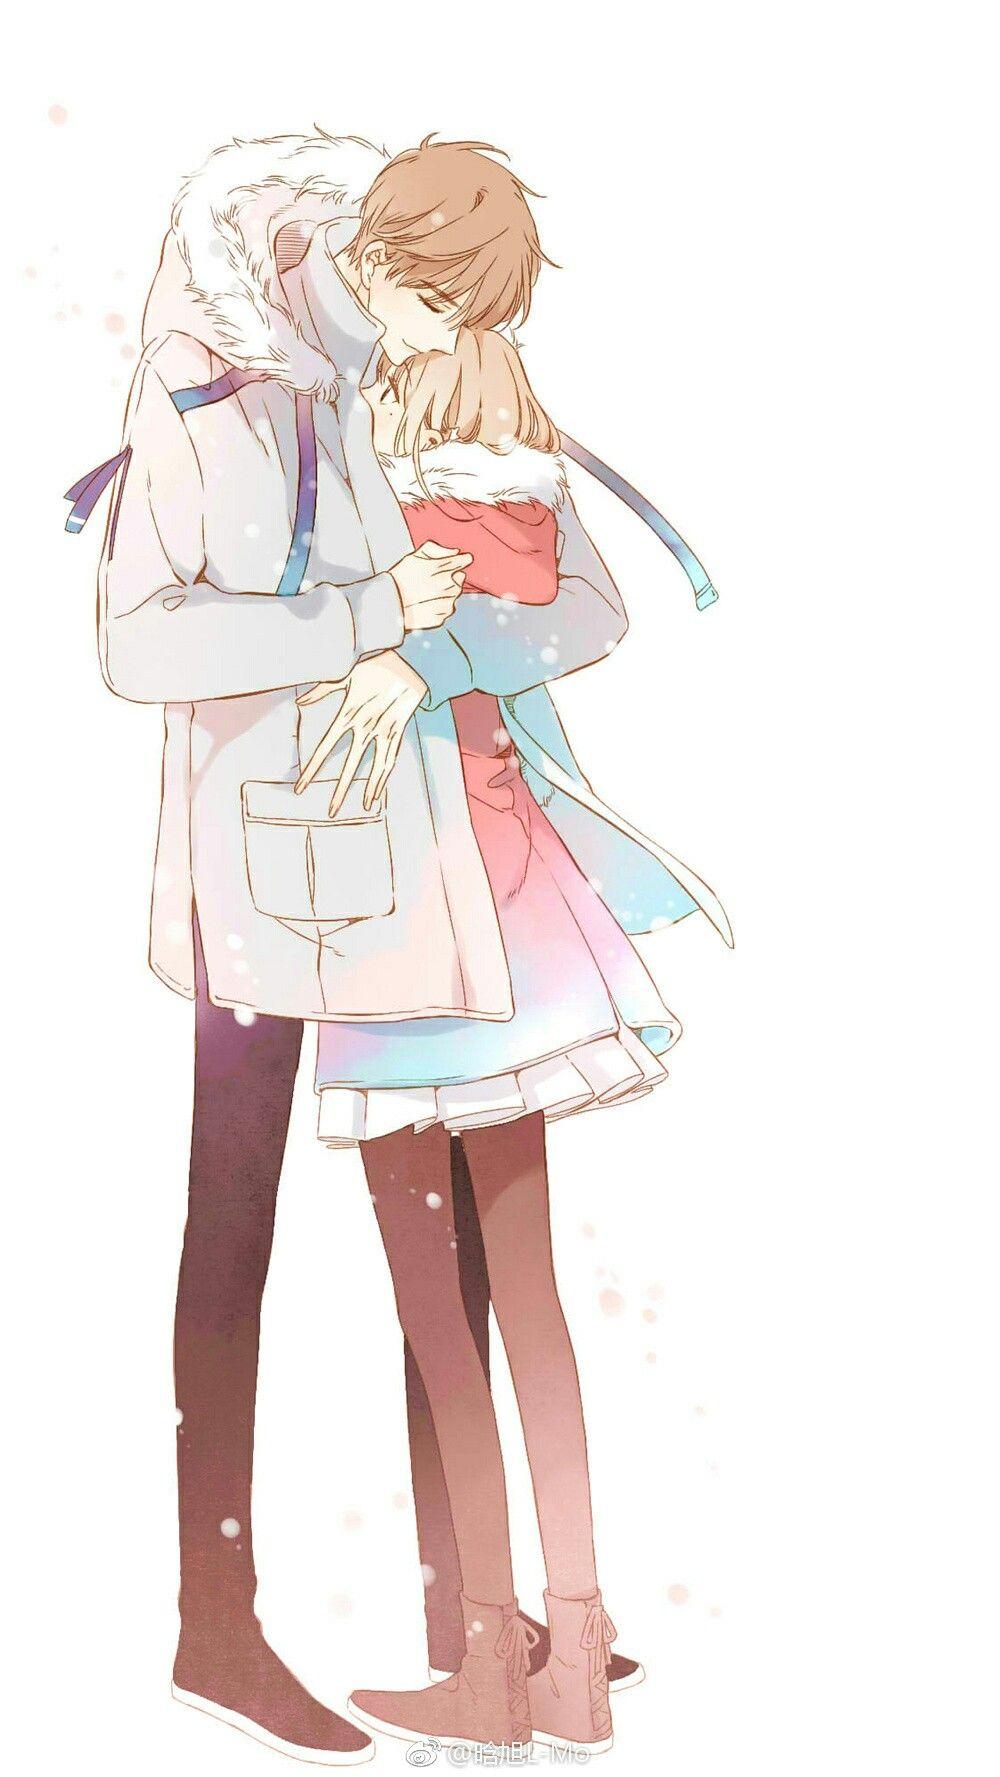 IDOLISH7/アイナナ Anime anak laki laki, Orang animasi, dan Idol